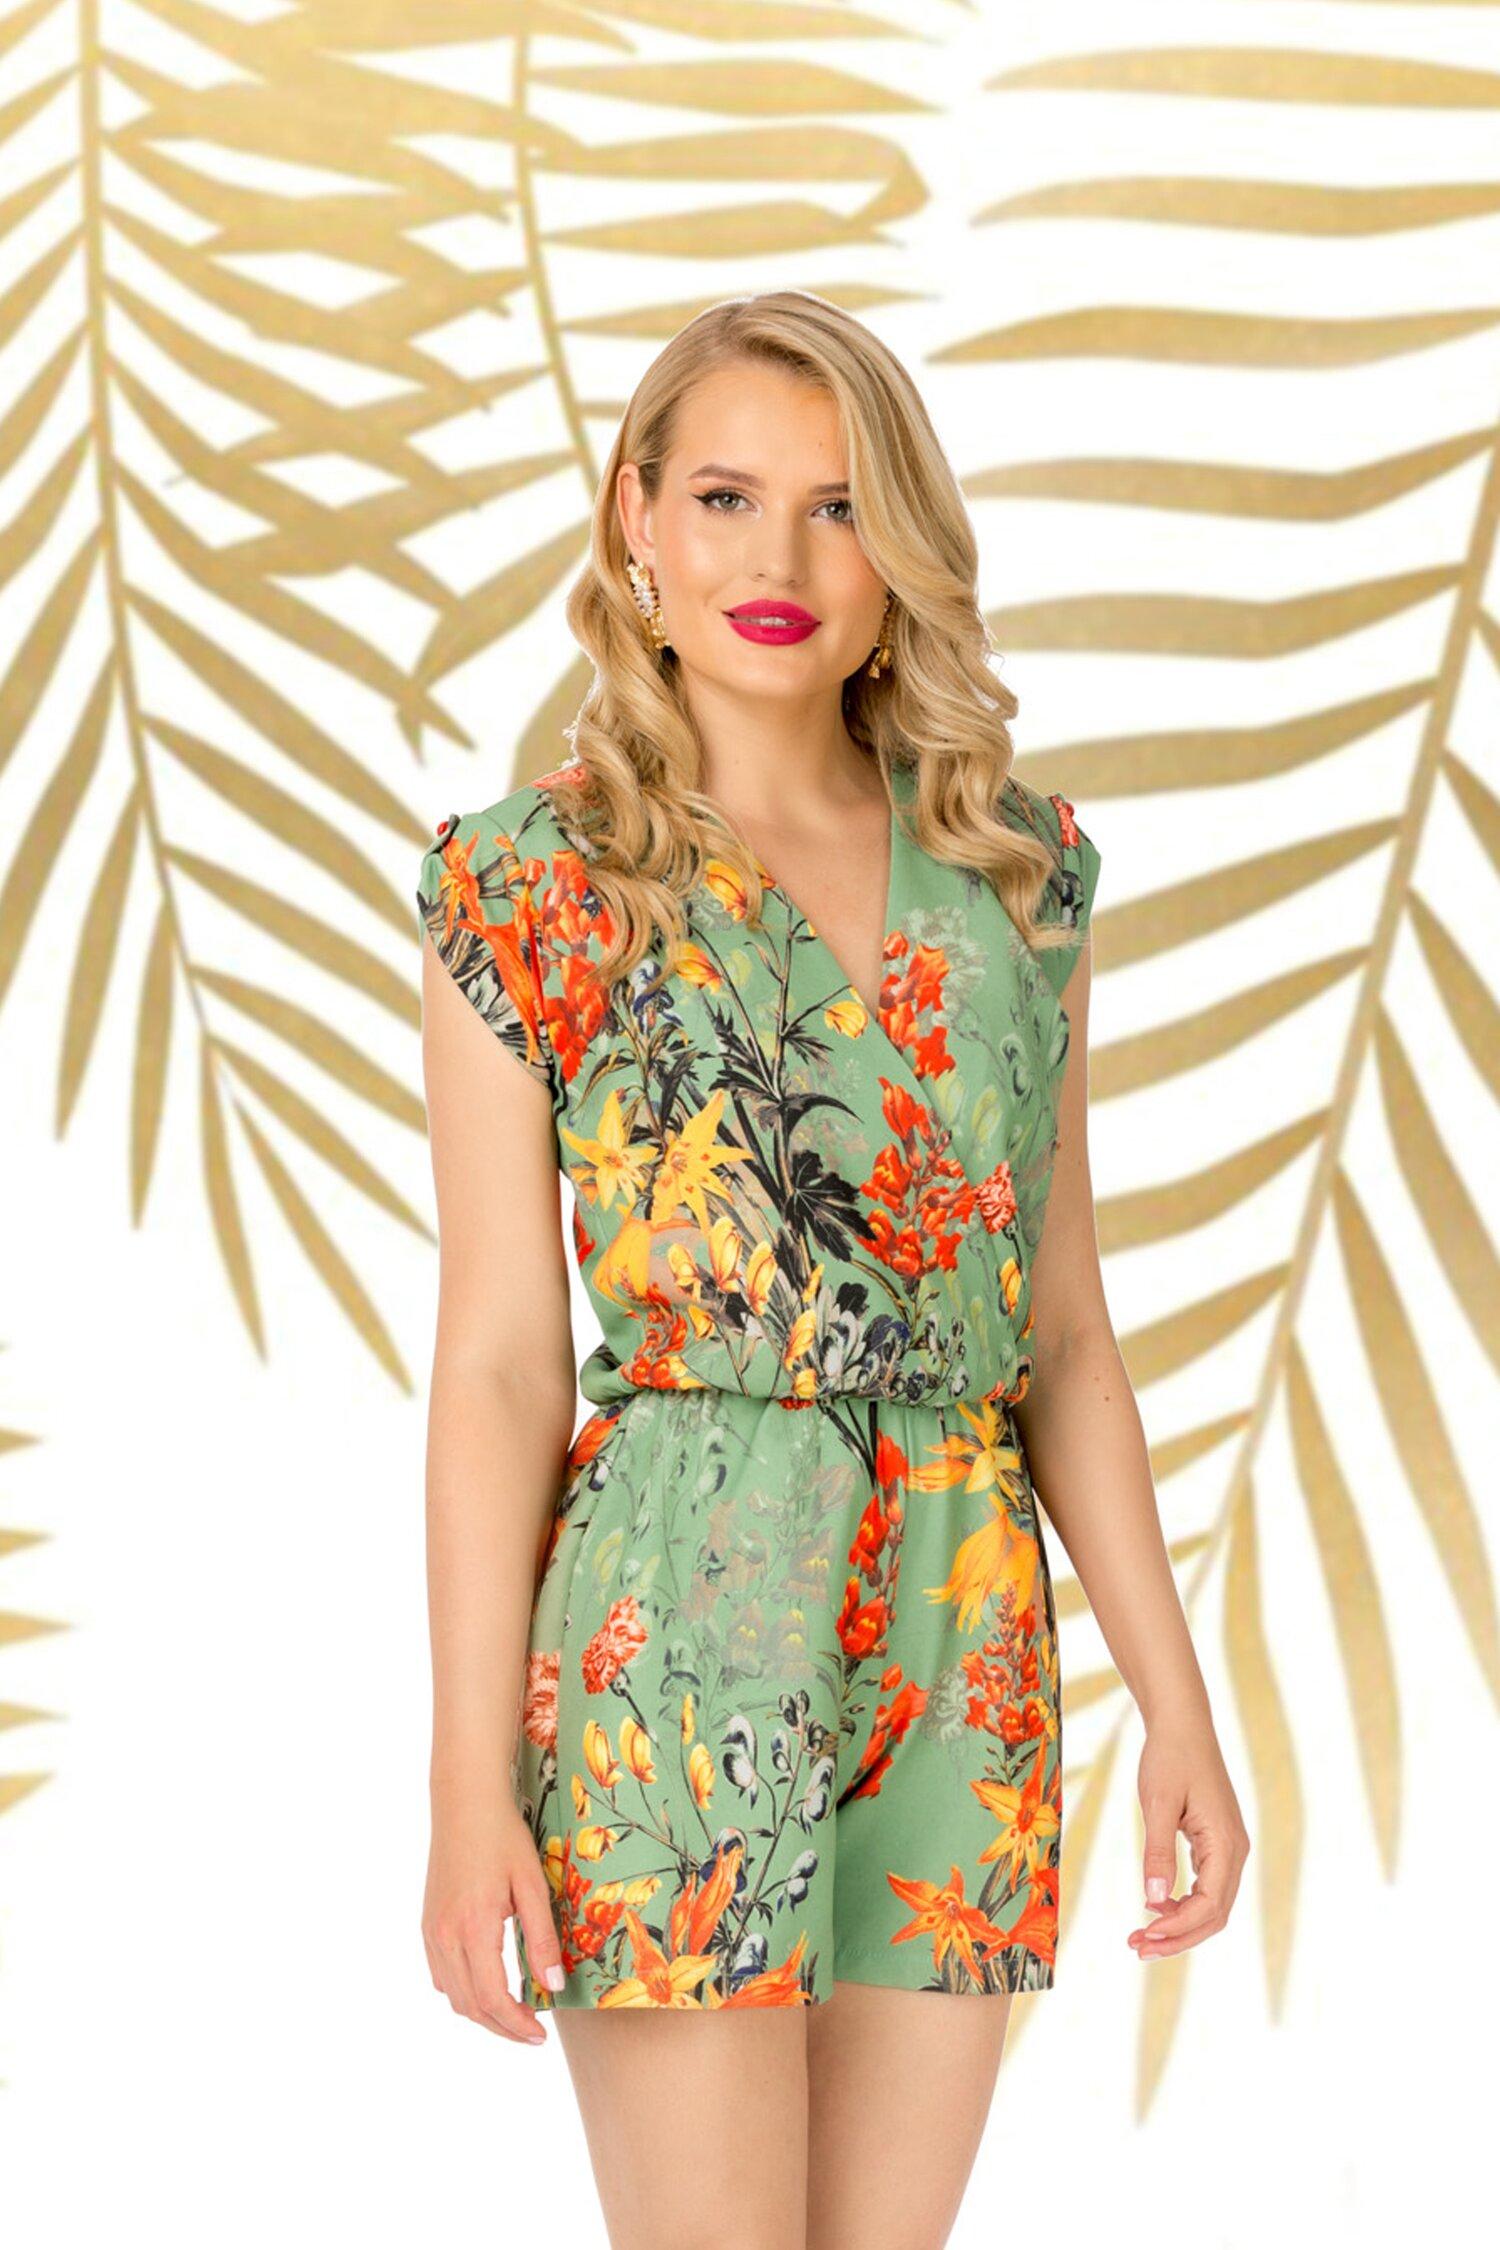 Salopeta scurta Pretty Girl verde cu imprimeuri florale orange